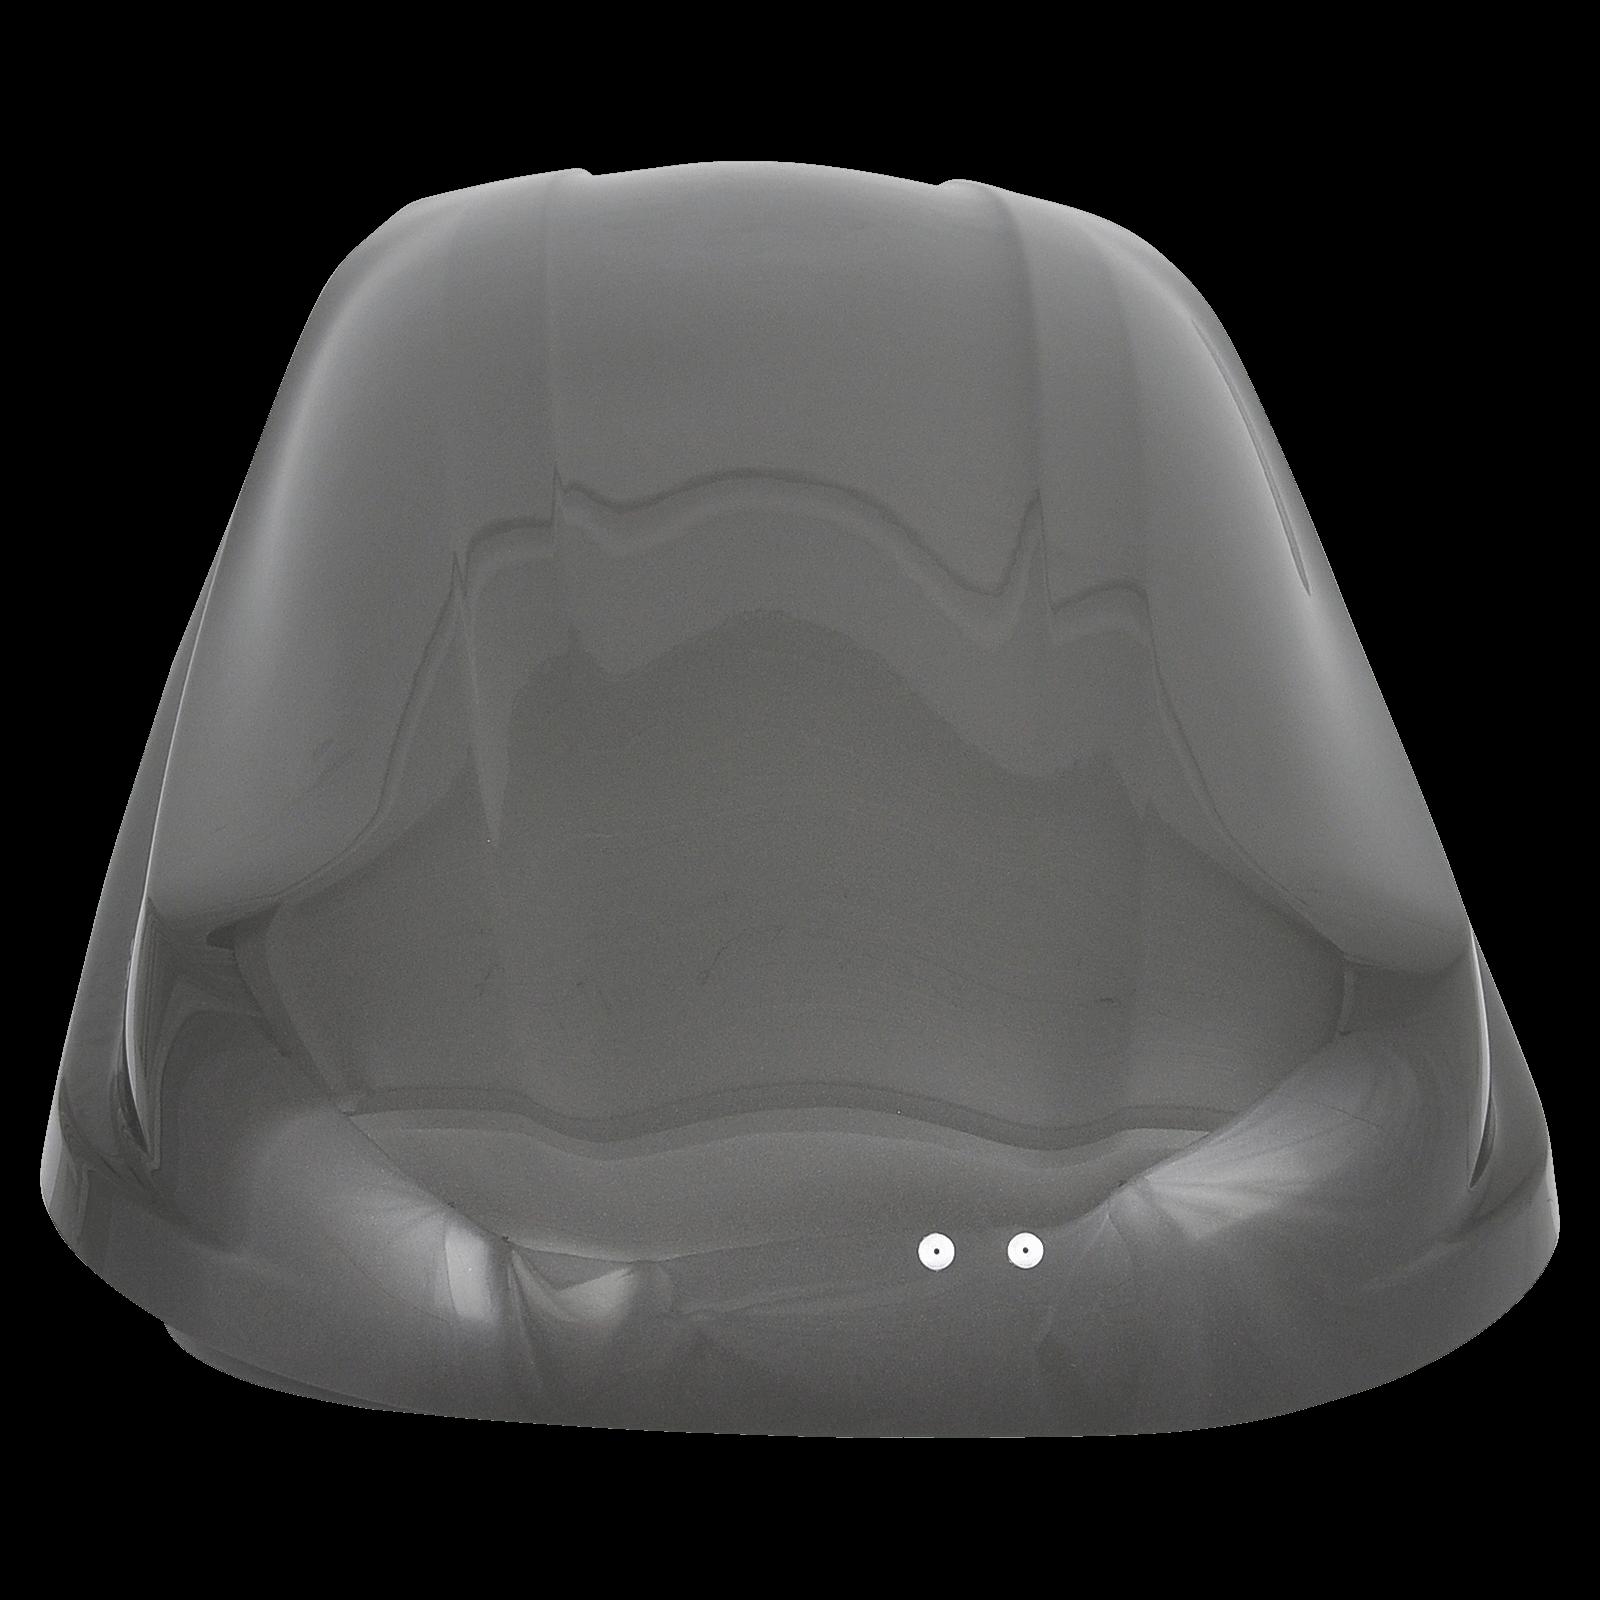 Dachbox Junior Altro 460 grau glänzend - Bild 3